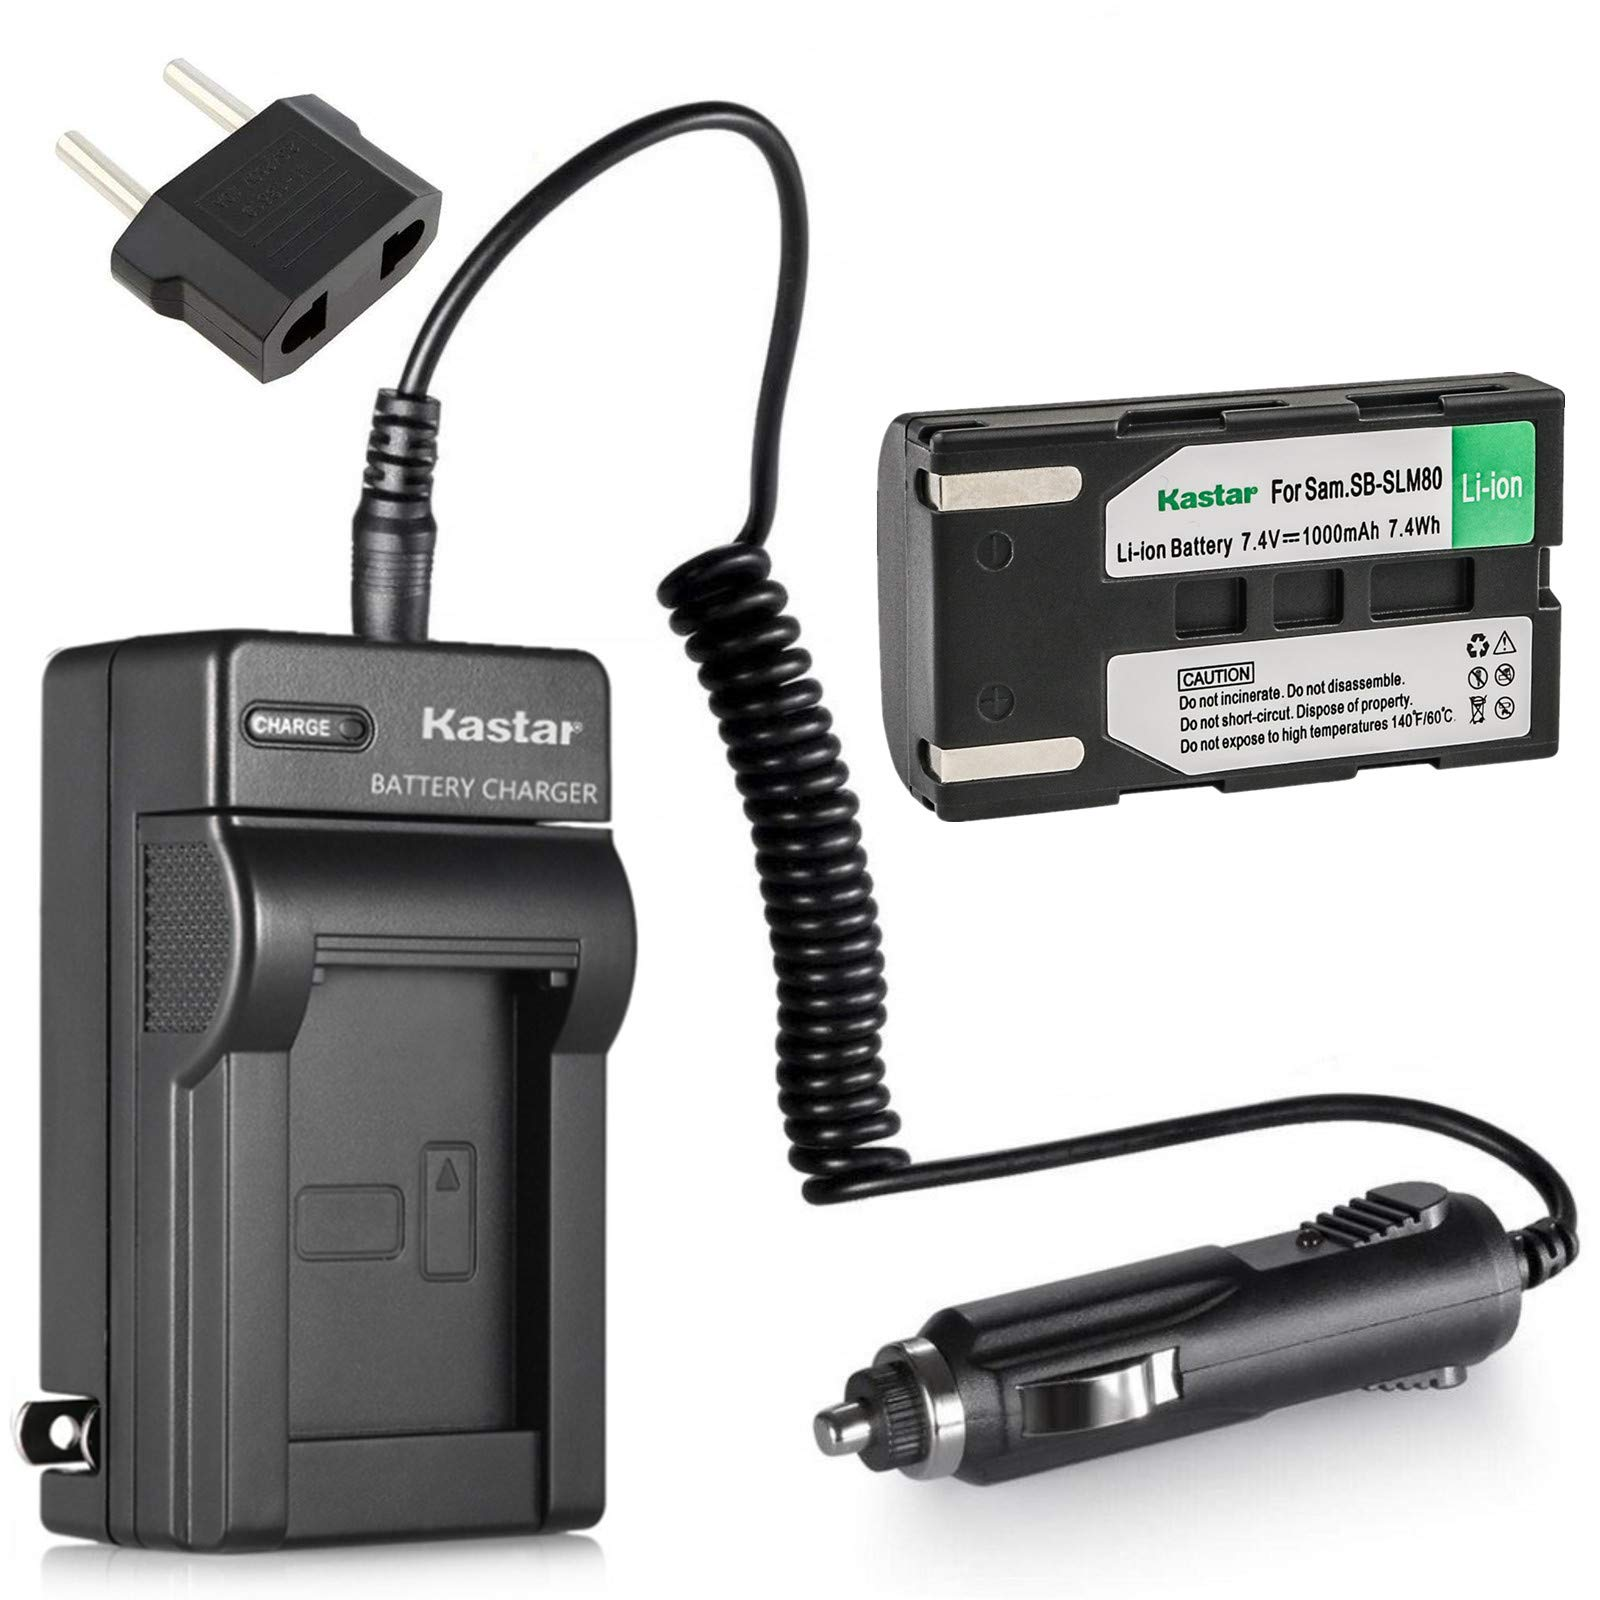 Kastar Battery and Charger for Samsung SB-LSM80 SB-LSM160 SB-LSM320 and SC-DC163 SC-DC164 SC-DC165 SC-DC171 SC-DC173 SC-DC563 SC-DC564 SC-DC575 SC-D355 SC-D365 SC-D366 SC-D371 SC-D372 SC-D375 SC-D453